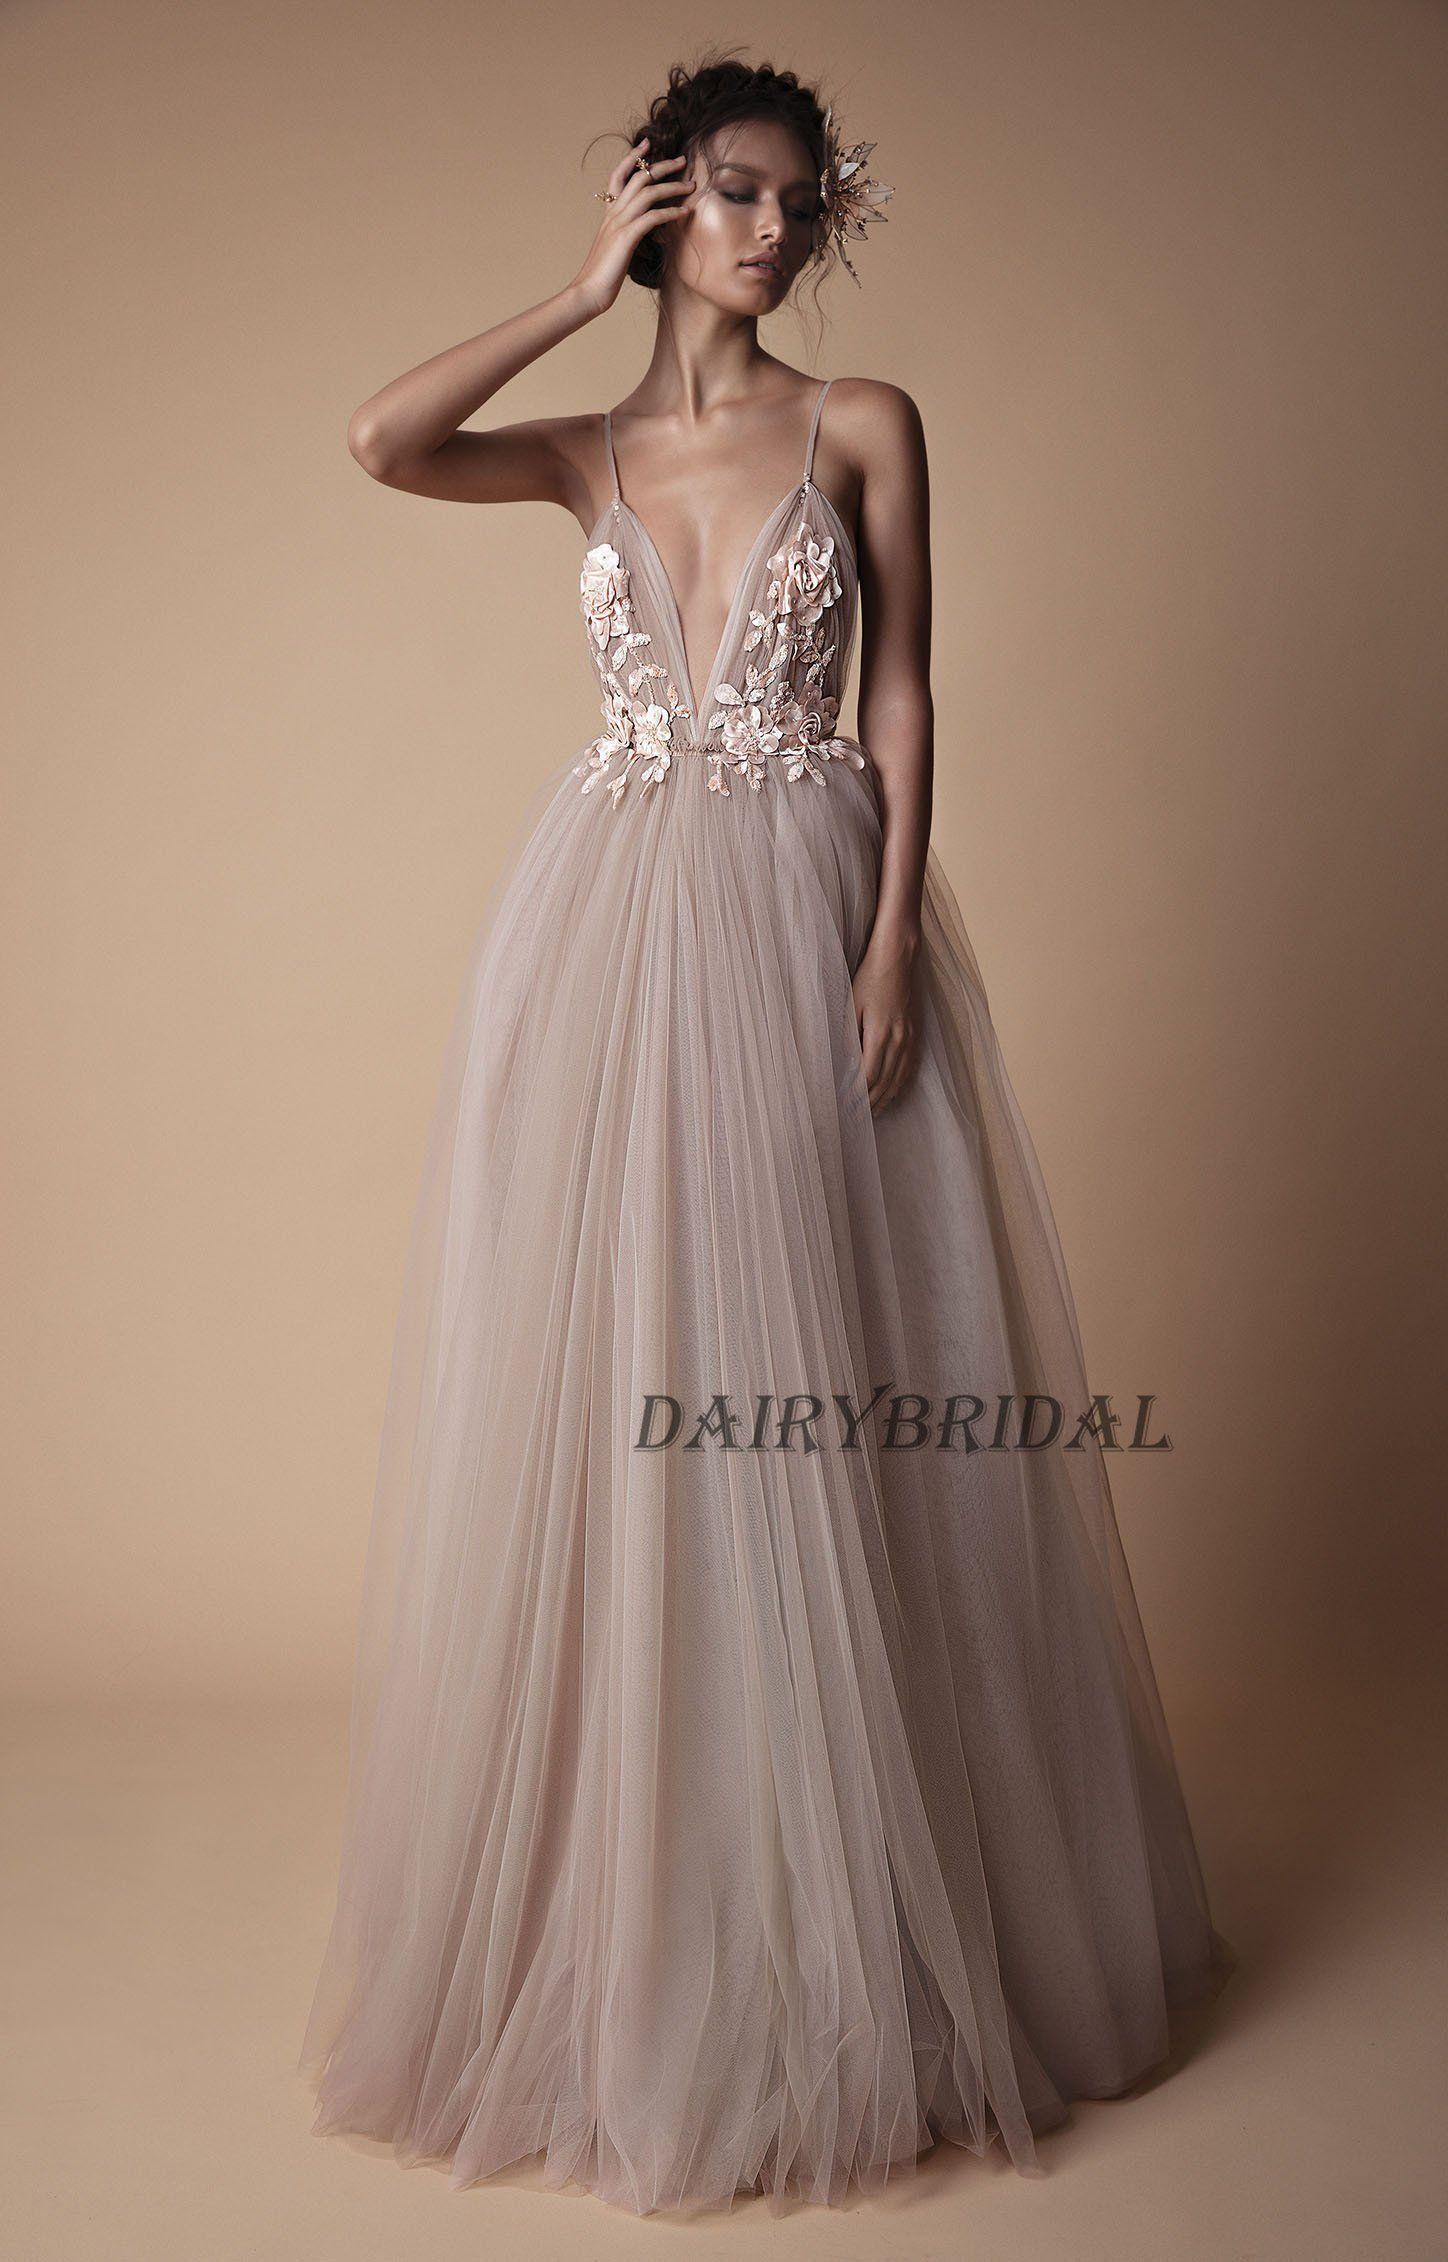 95a444702a03998 Вечерние Наряды · Торжественная Вечеринка · Свадебное Платье · Советы О  Моде · Spaghetti Straps Prom Dress, Deep V-Neck Prom Dress, Tulle Prom  Dress,